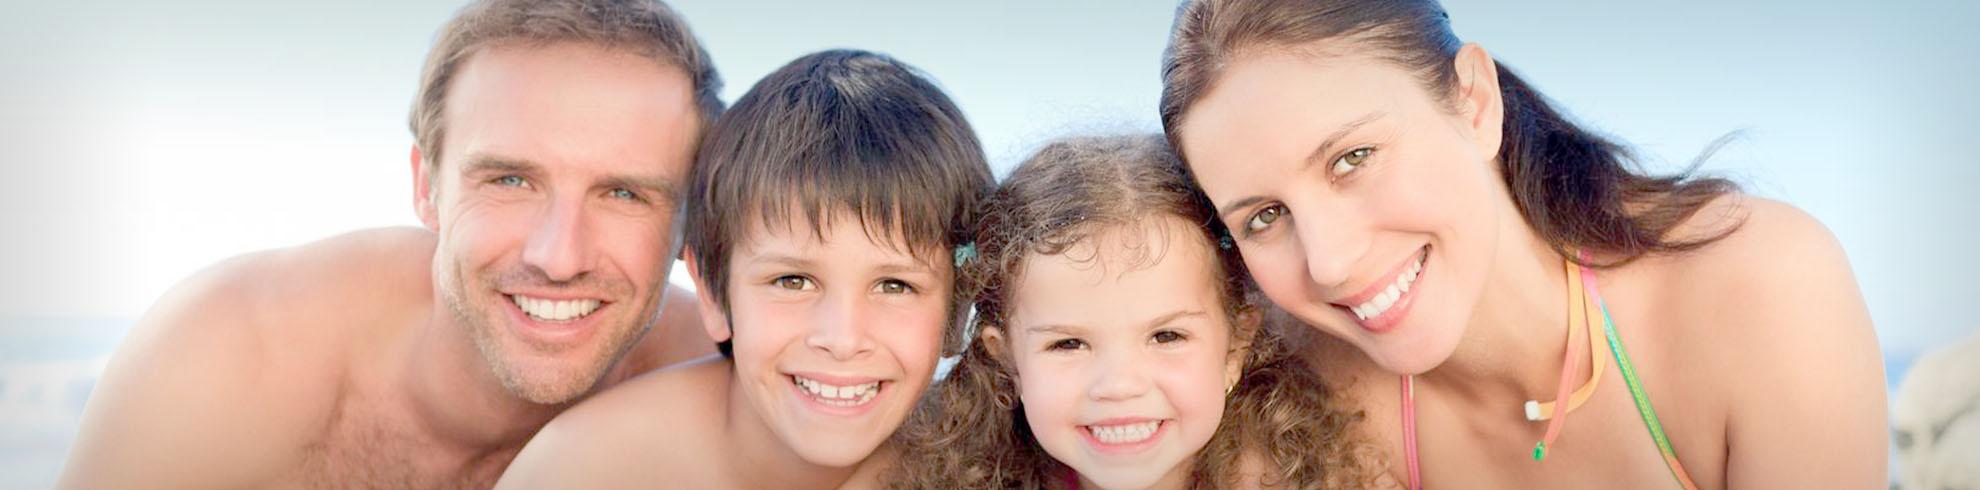 2slider-3-clinica-dental-giroca-torrevieja-implantas-blanqueamientos